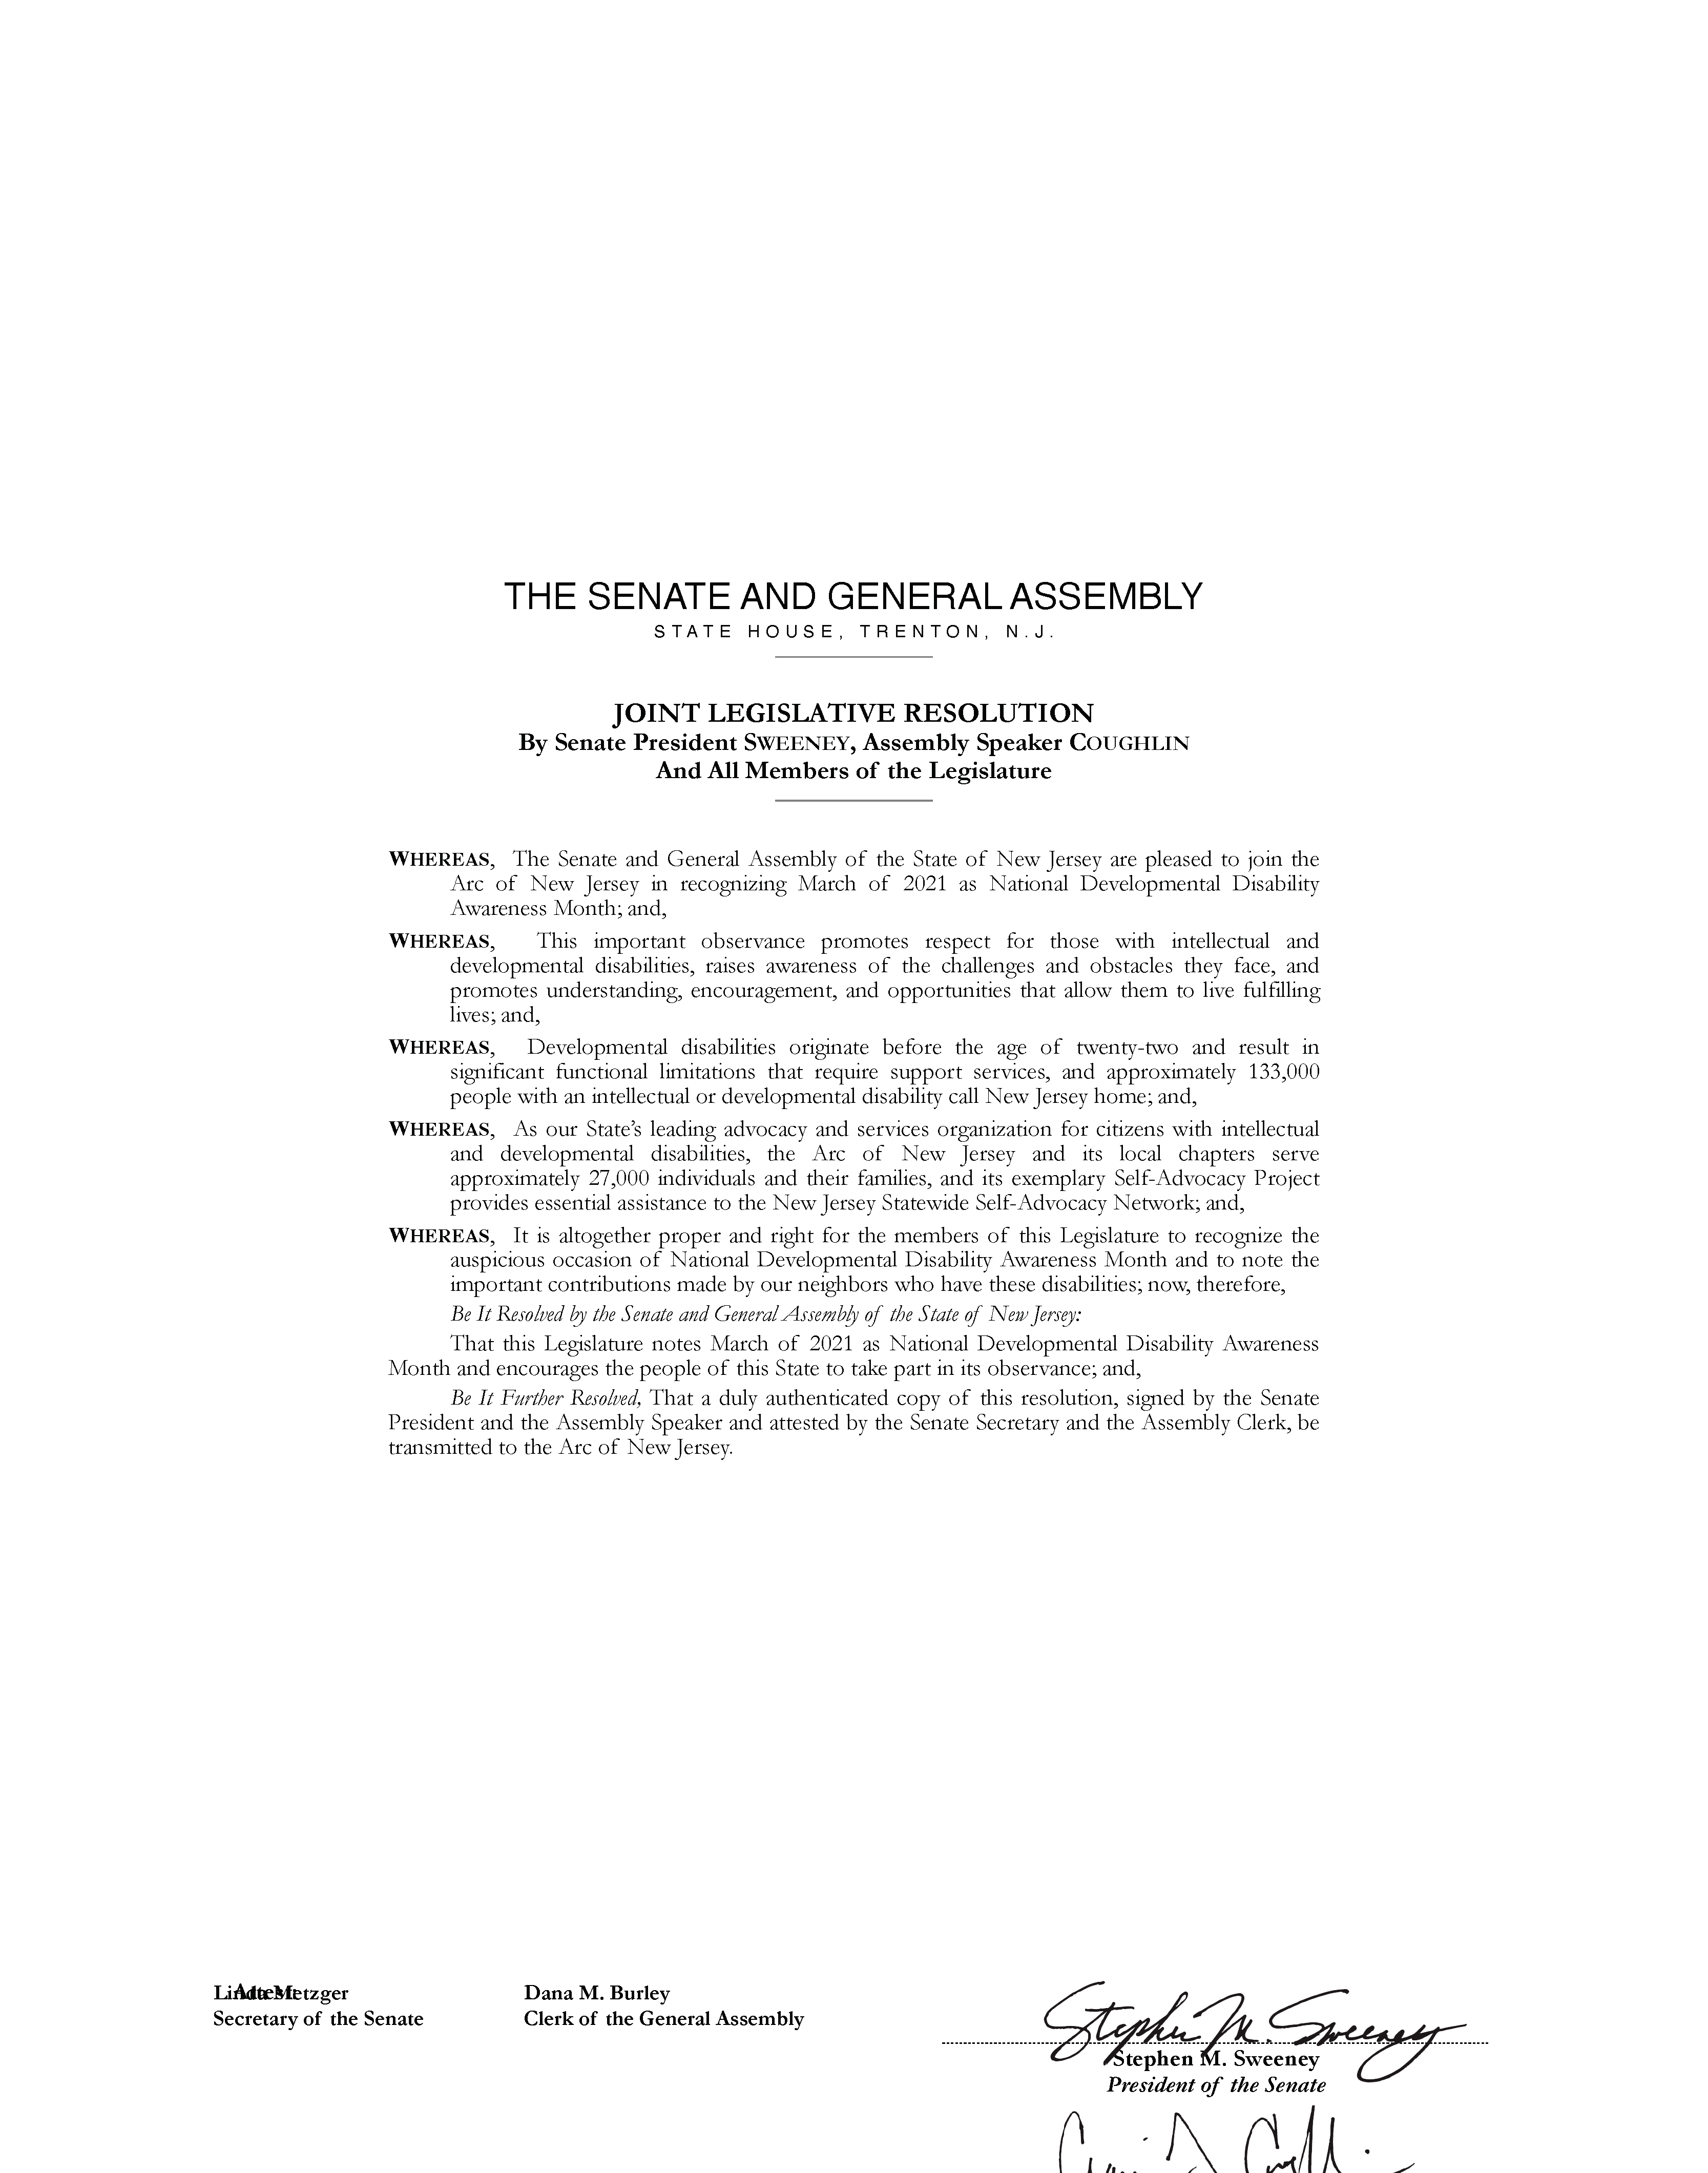 JOINT LEGISLATIVE RESOLUTION